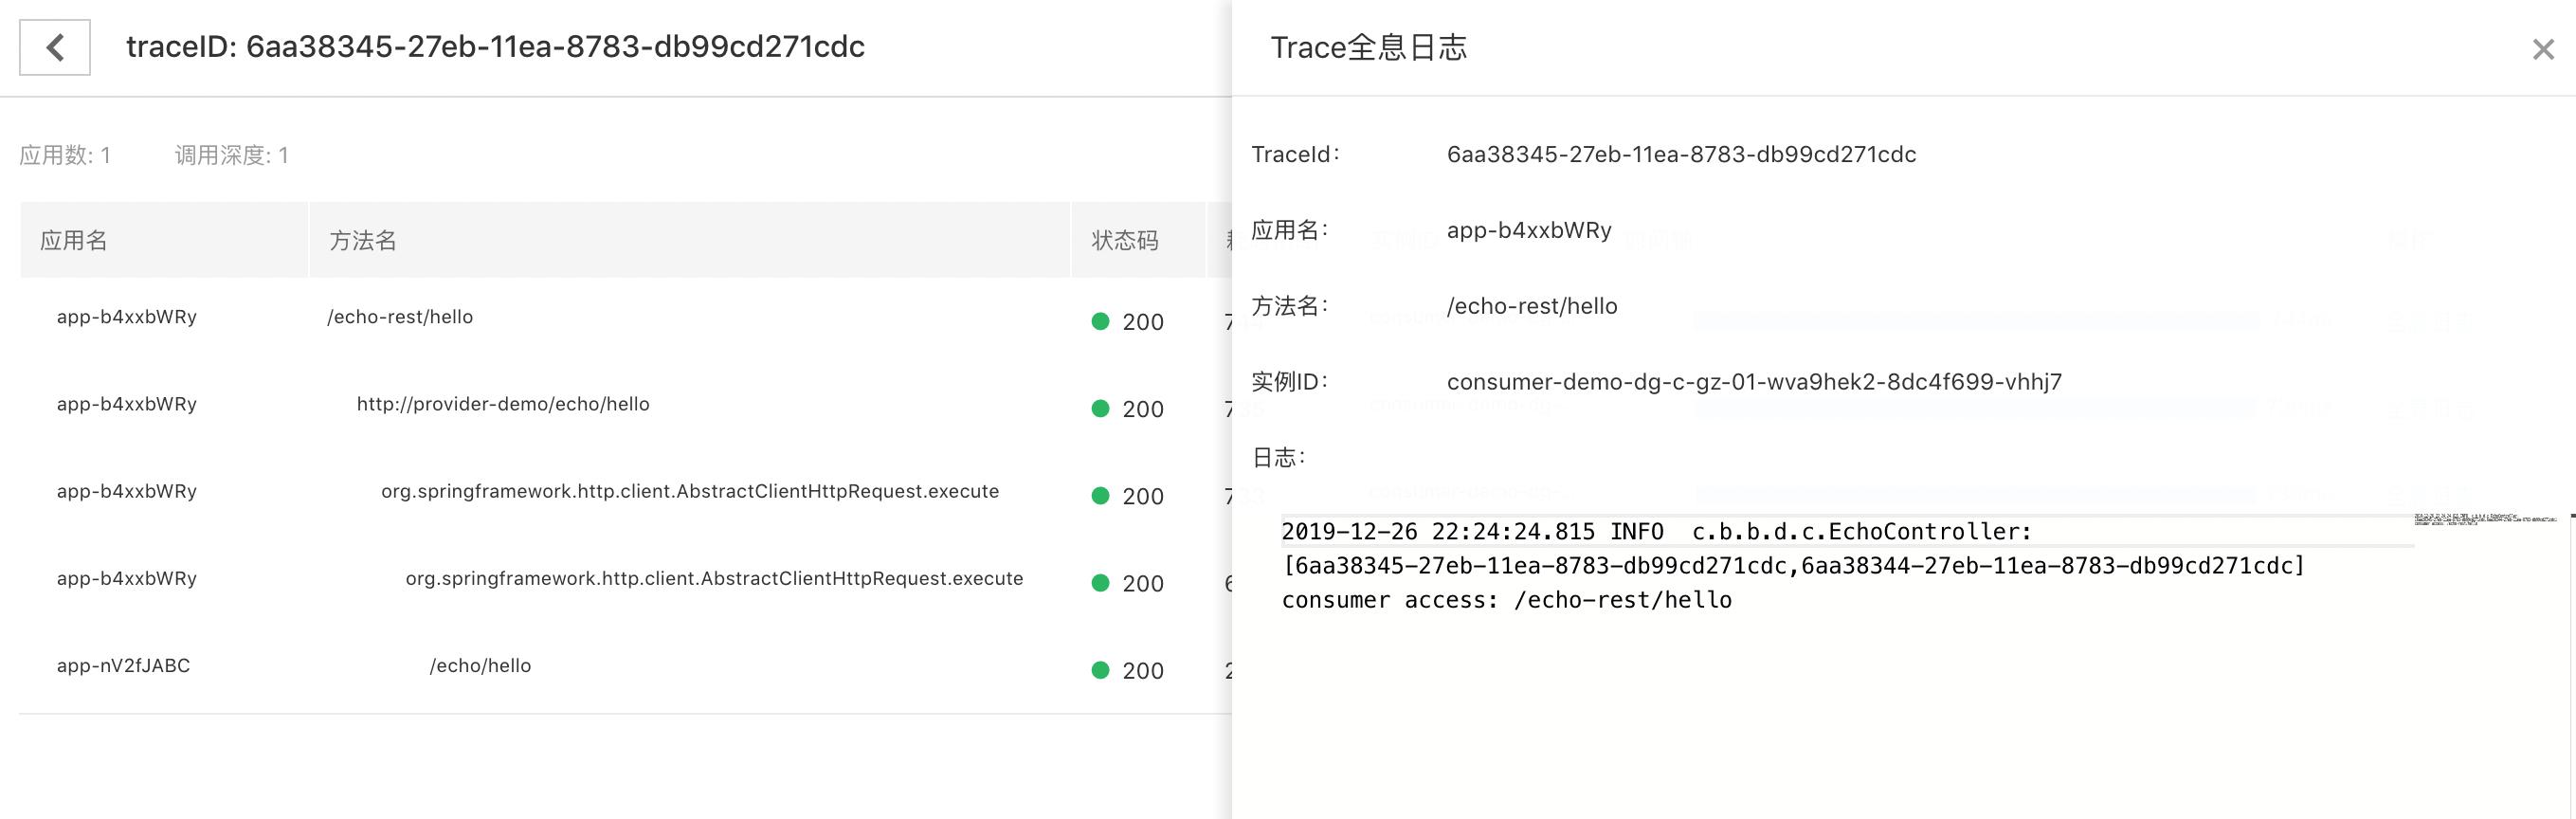 trace_log1.png